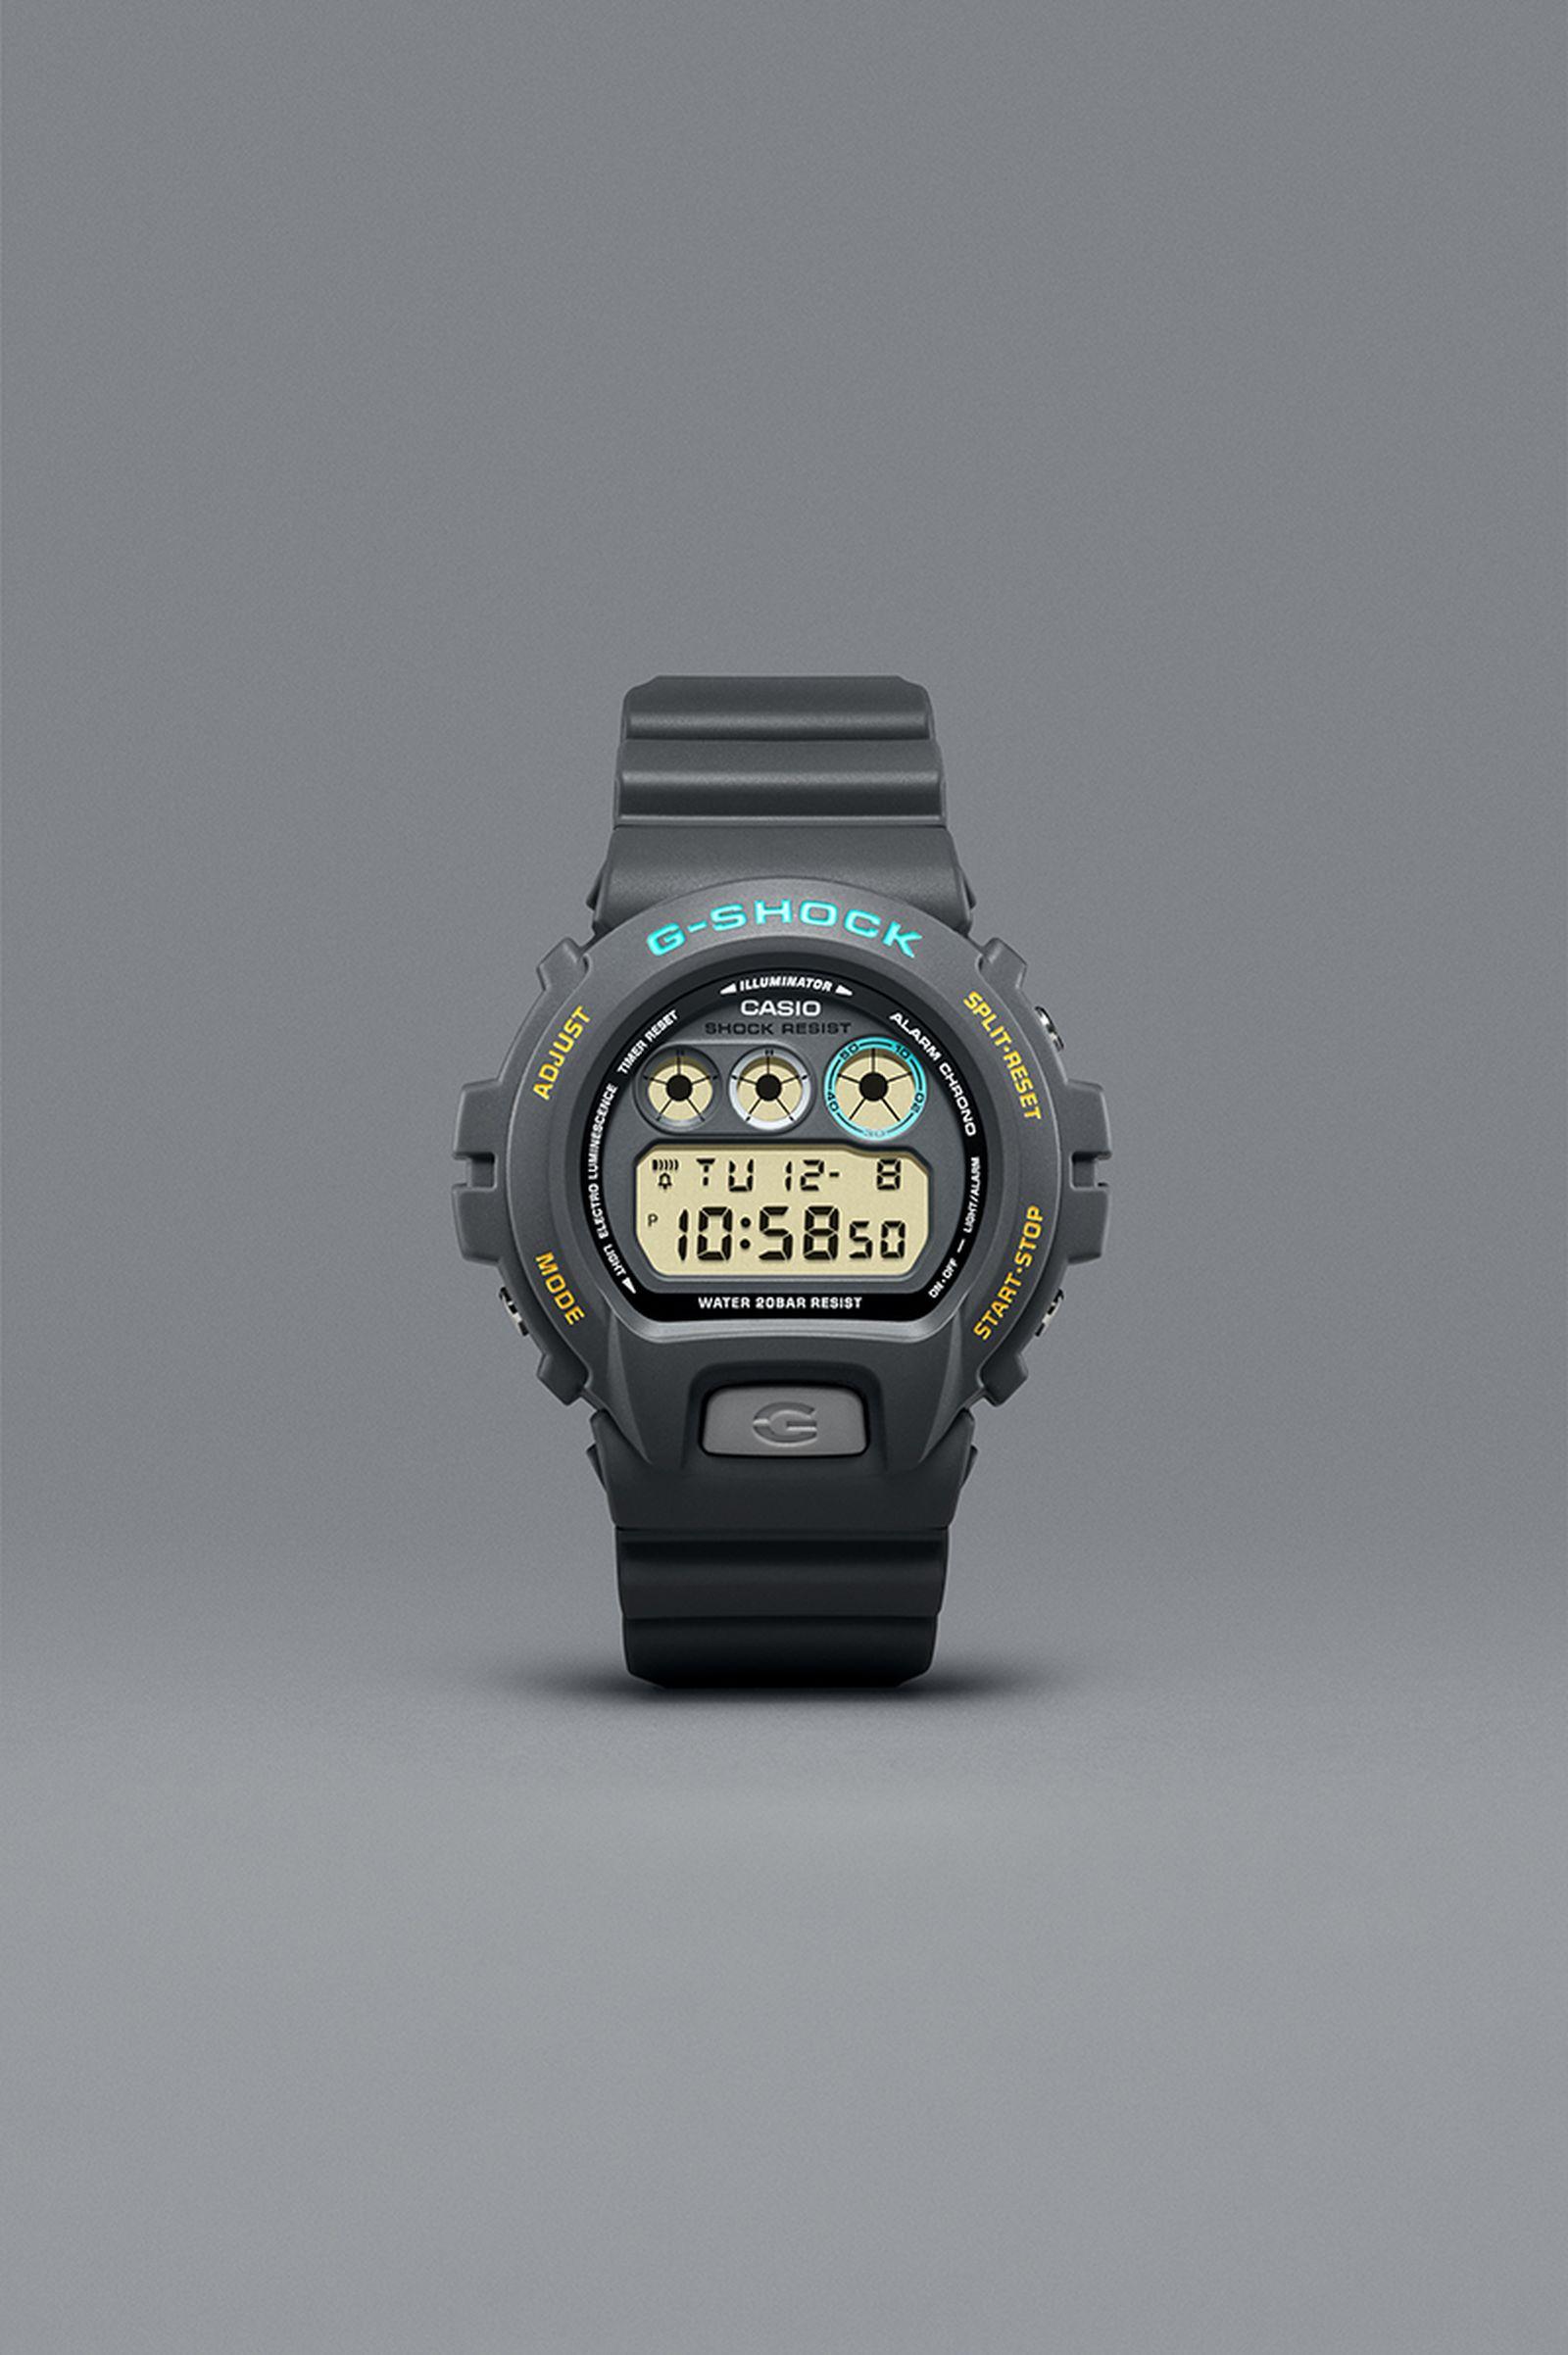 john-mayer-g-shock-ref-6900-02